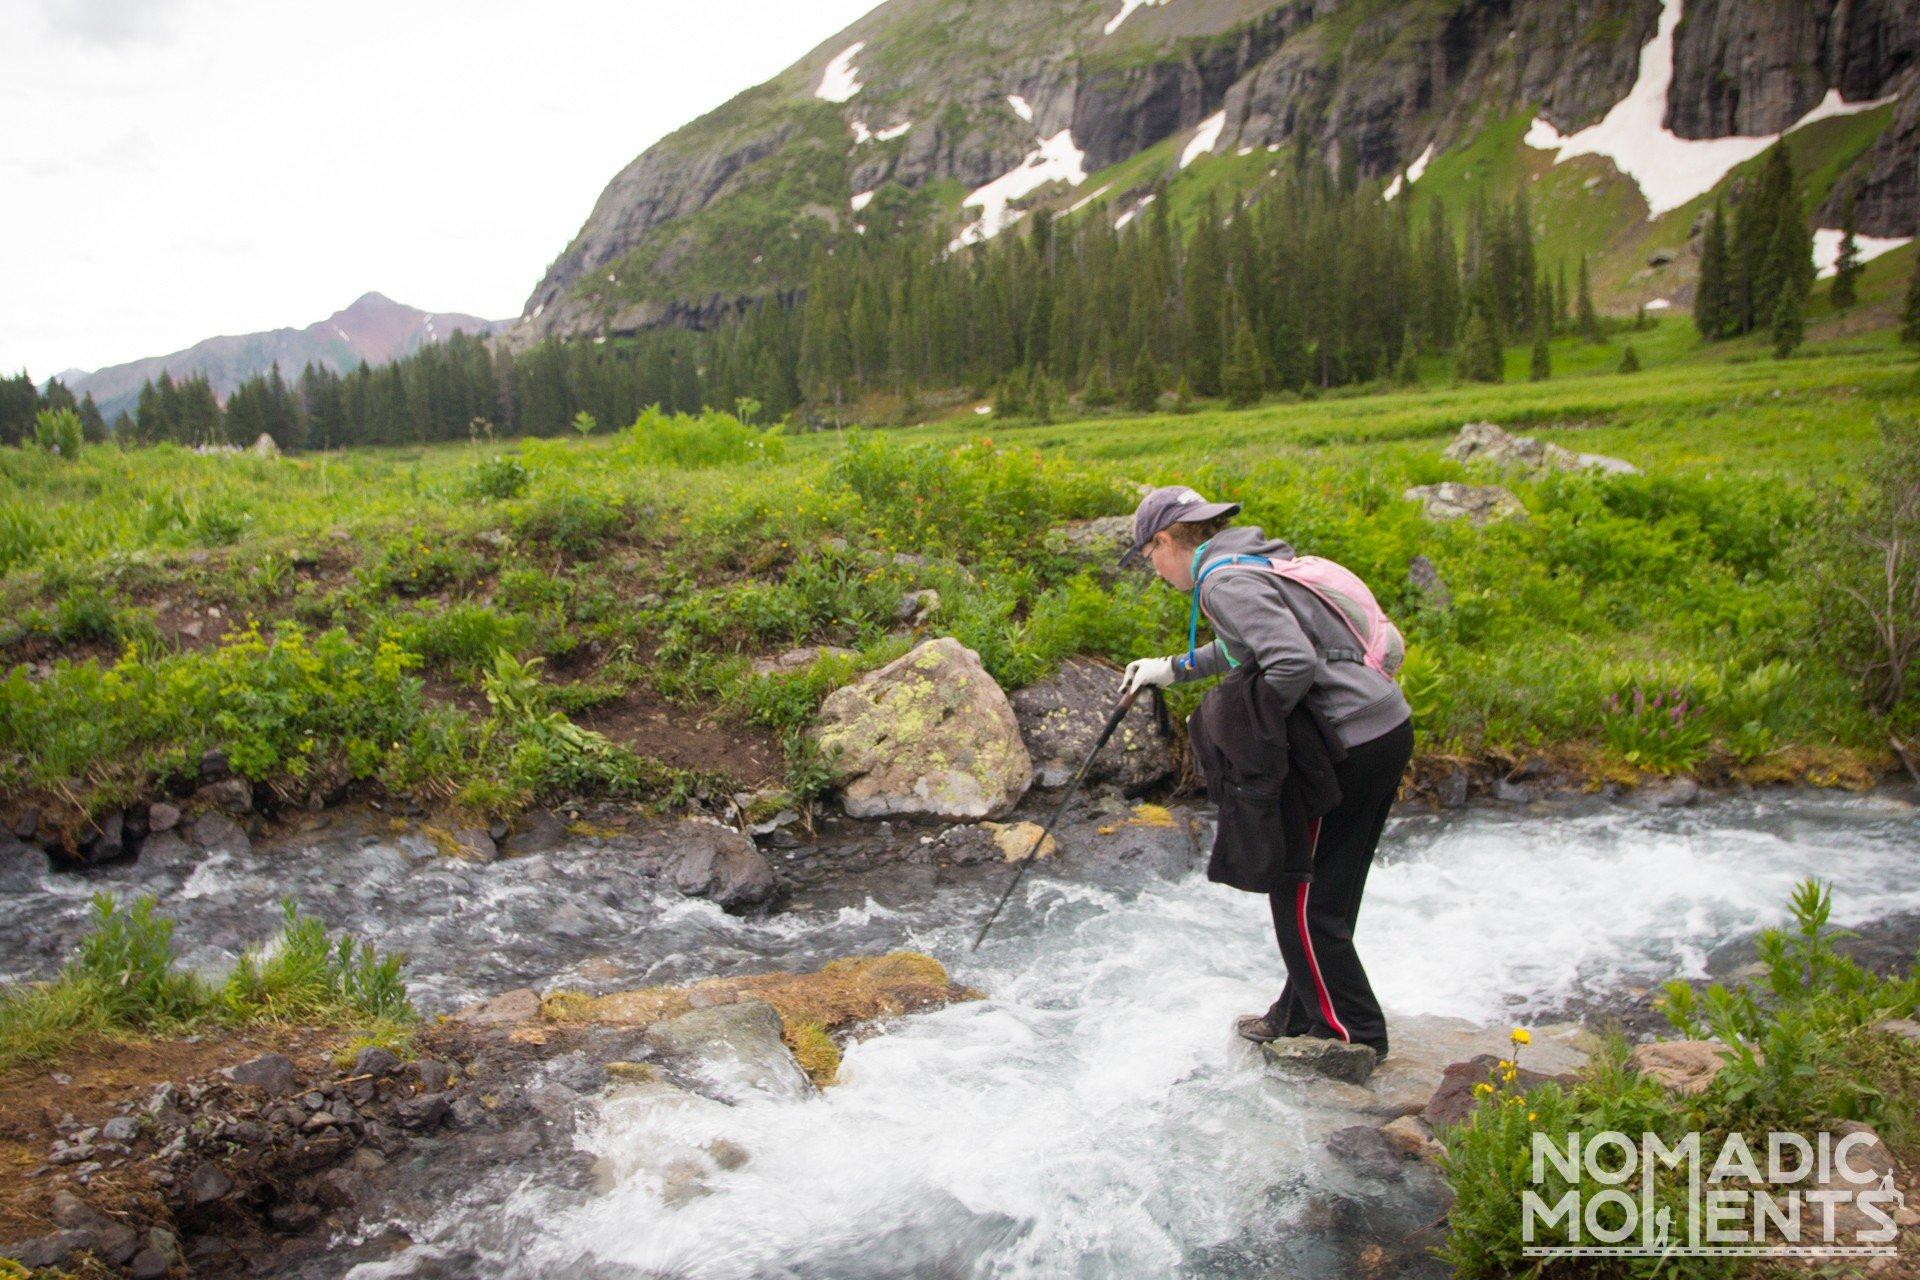 The Creek that runs through the Lower Ice Lake Basin